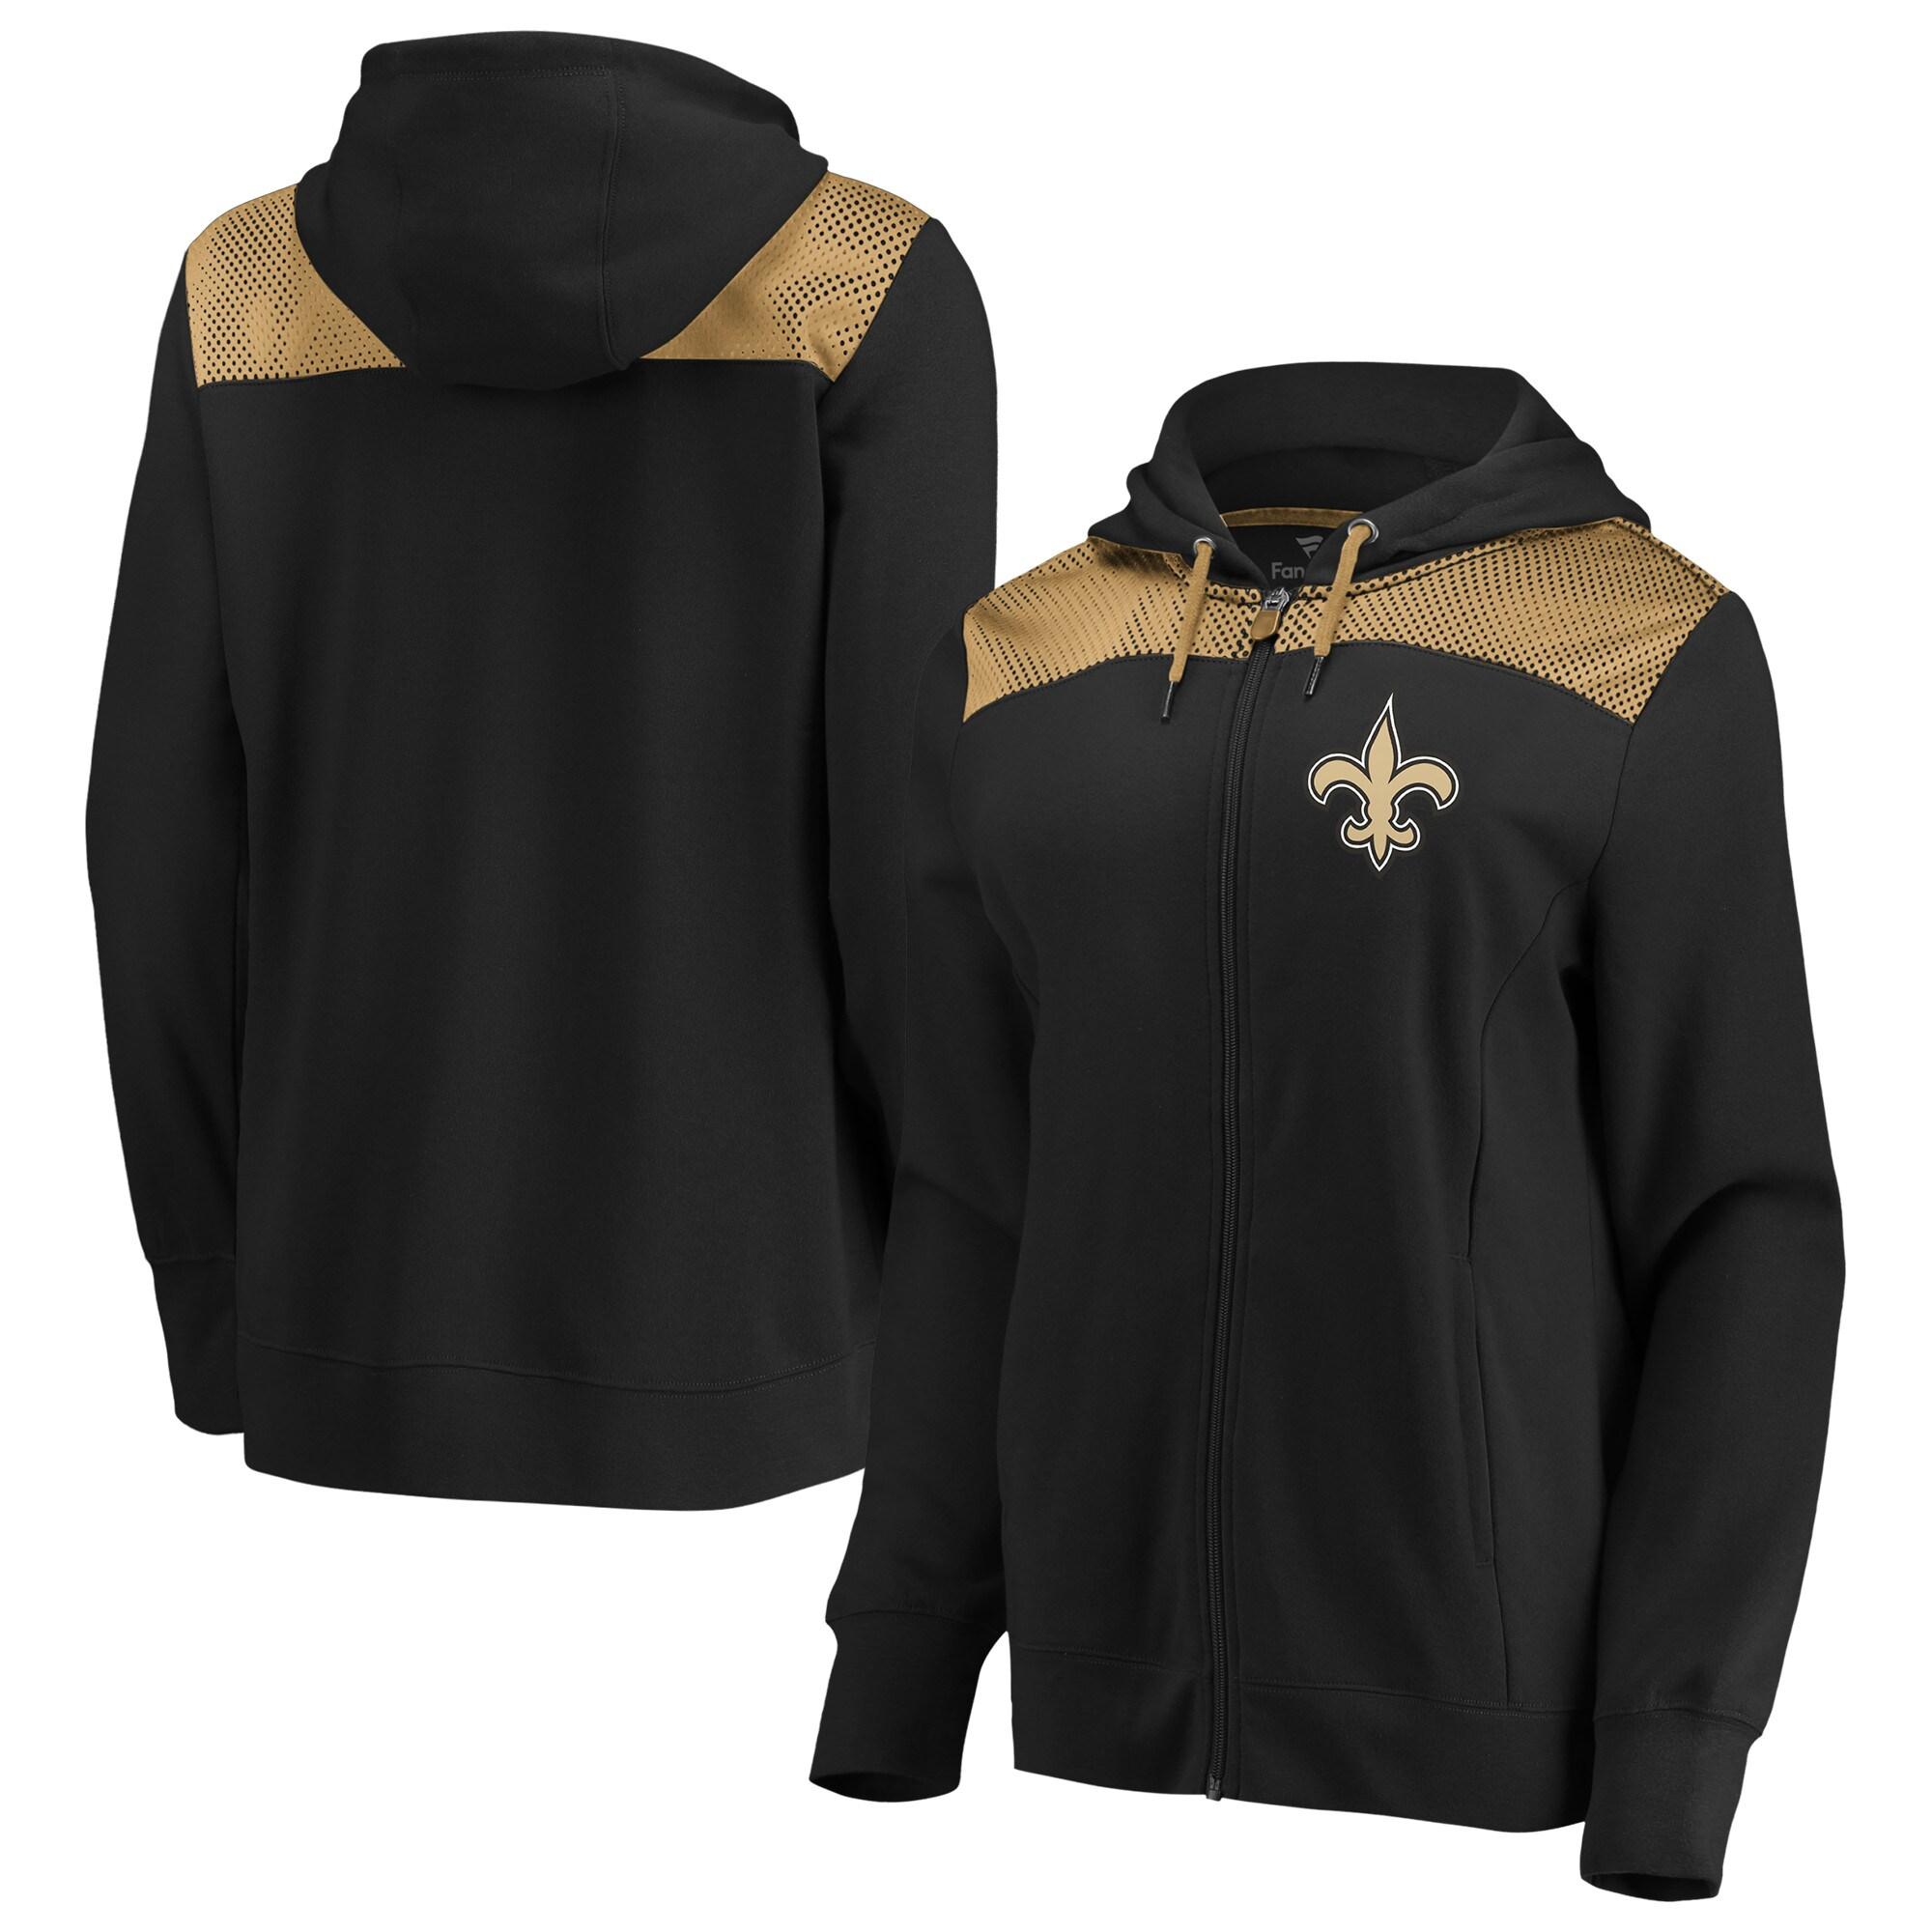 New Orleans Saints Fanatics Branded Women's Team Best Full-Zip Hoodie - Black